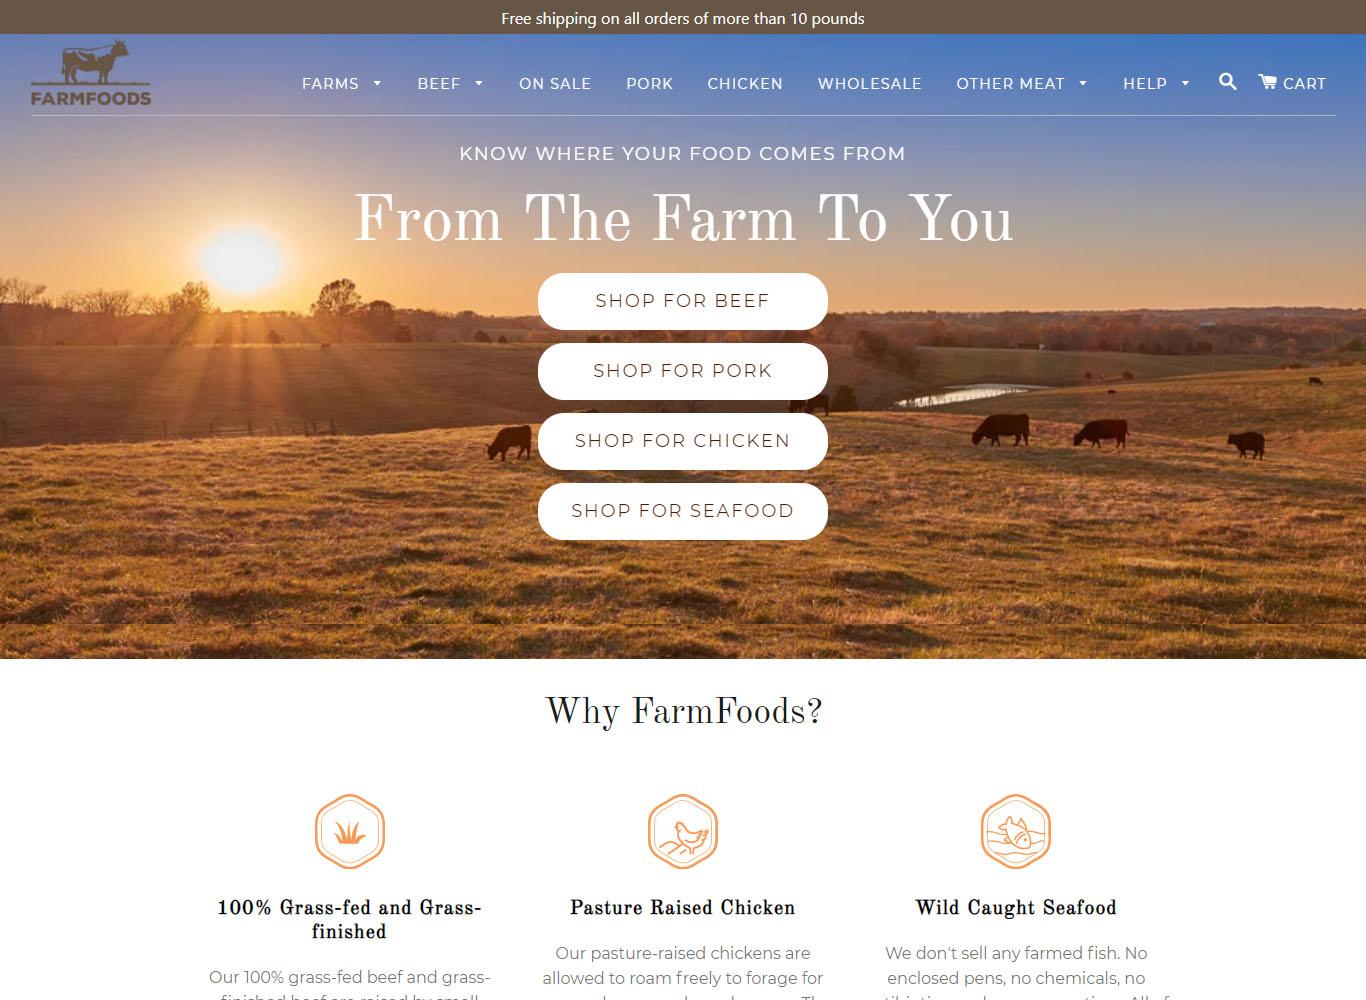 farmfoodsmarket